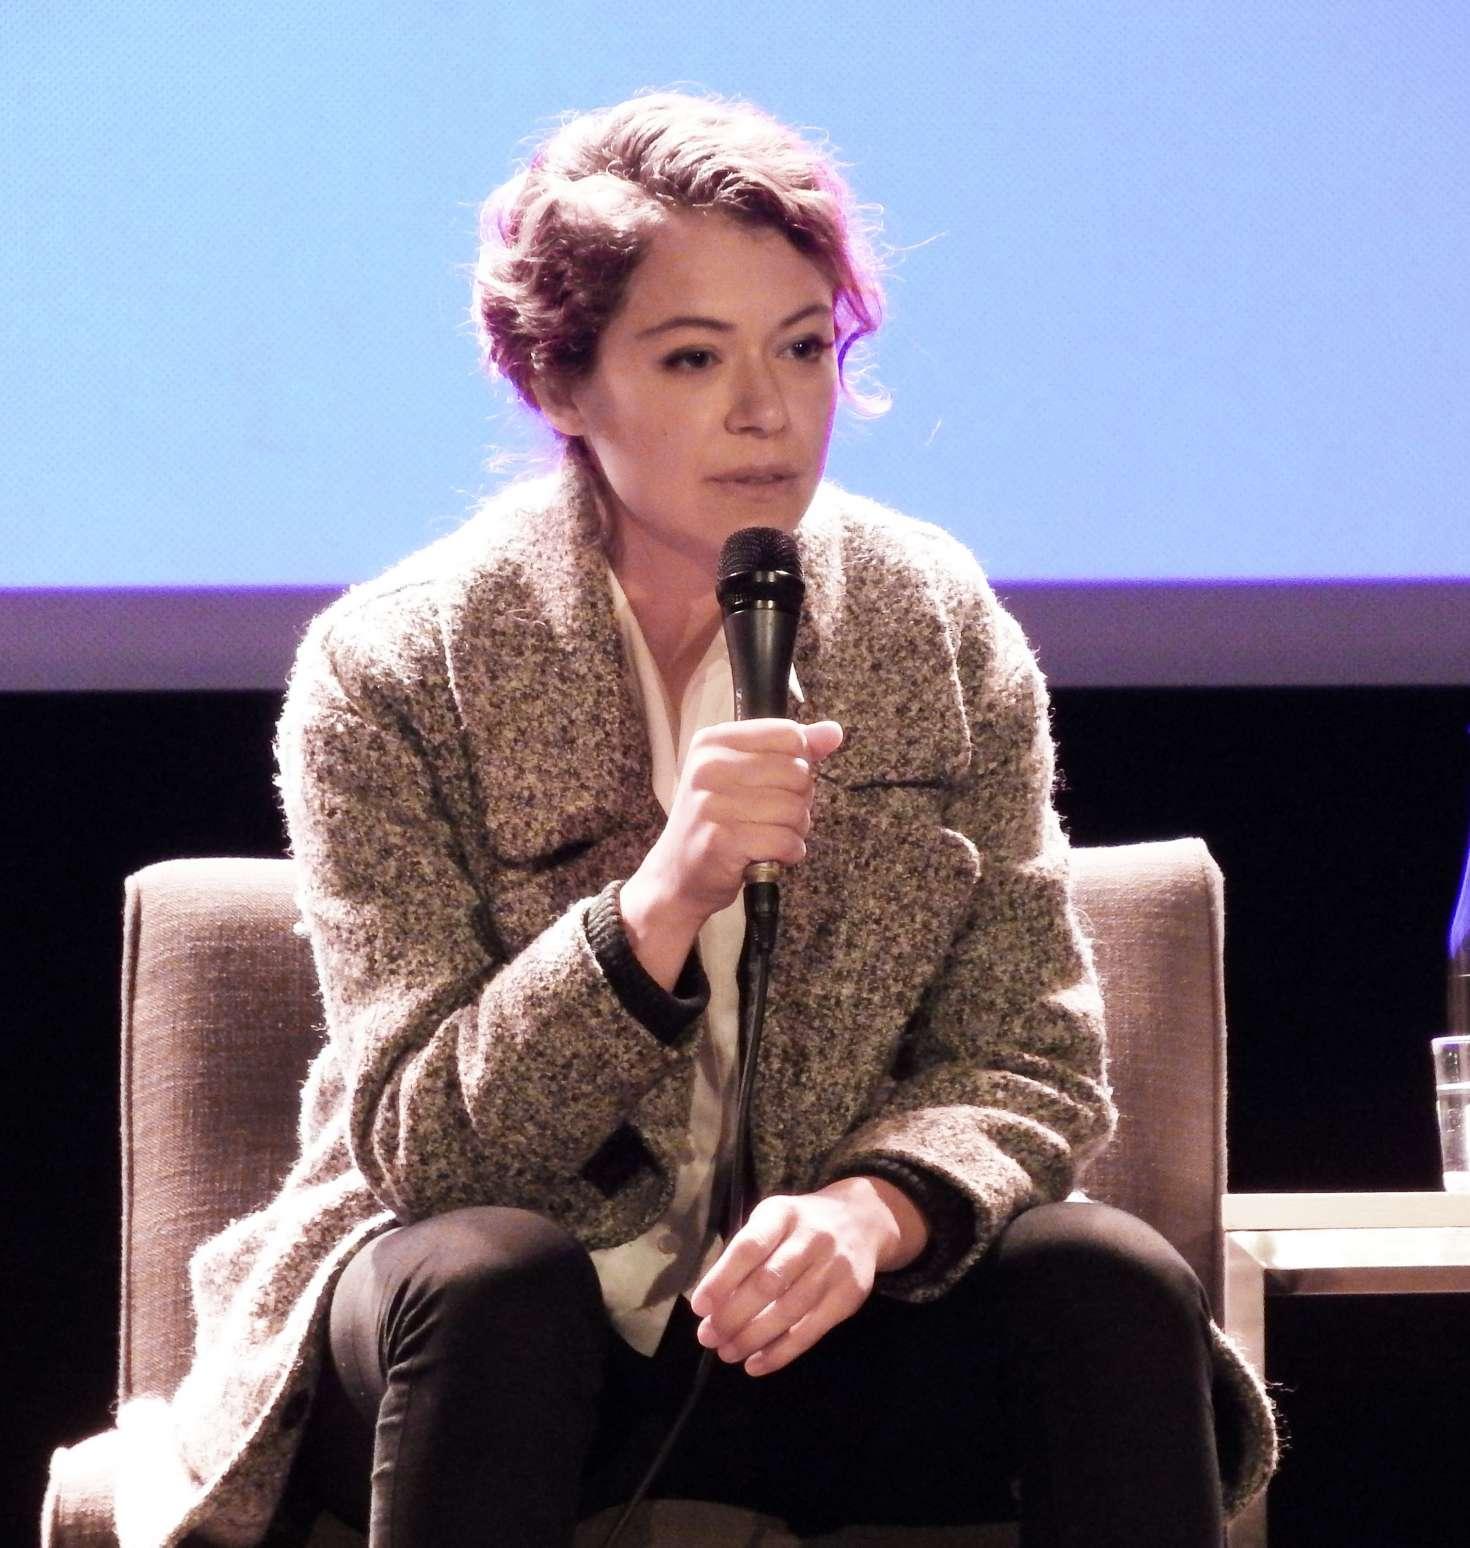 Tatiana Maslany - Speaks at the VIFF in Vancouver